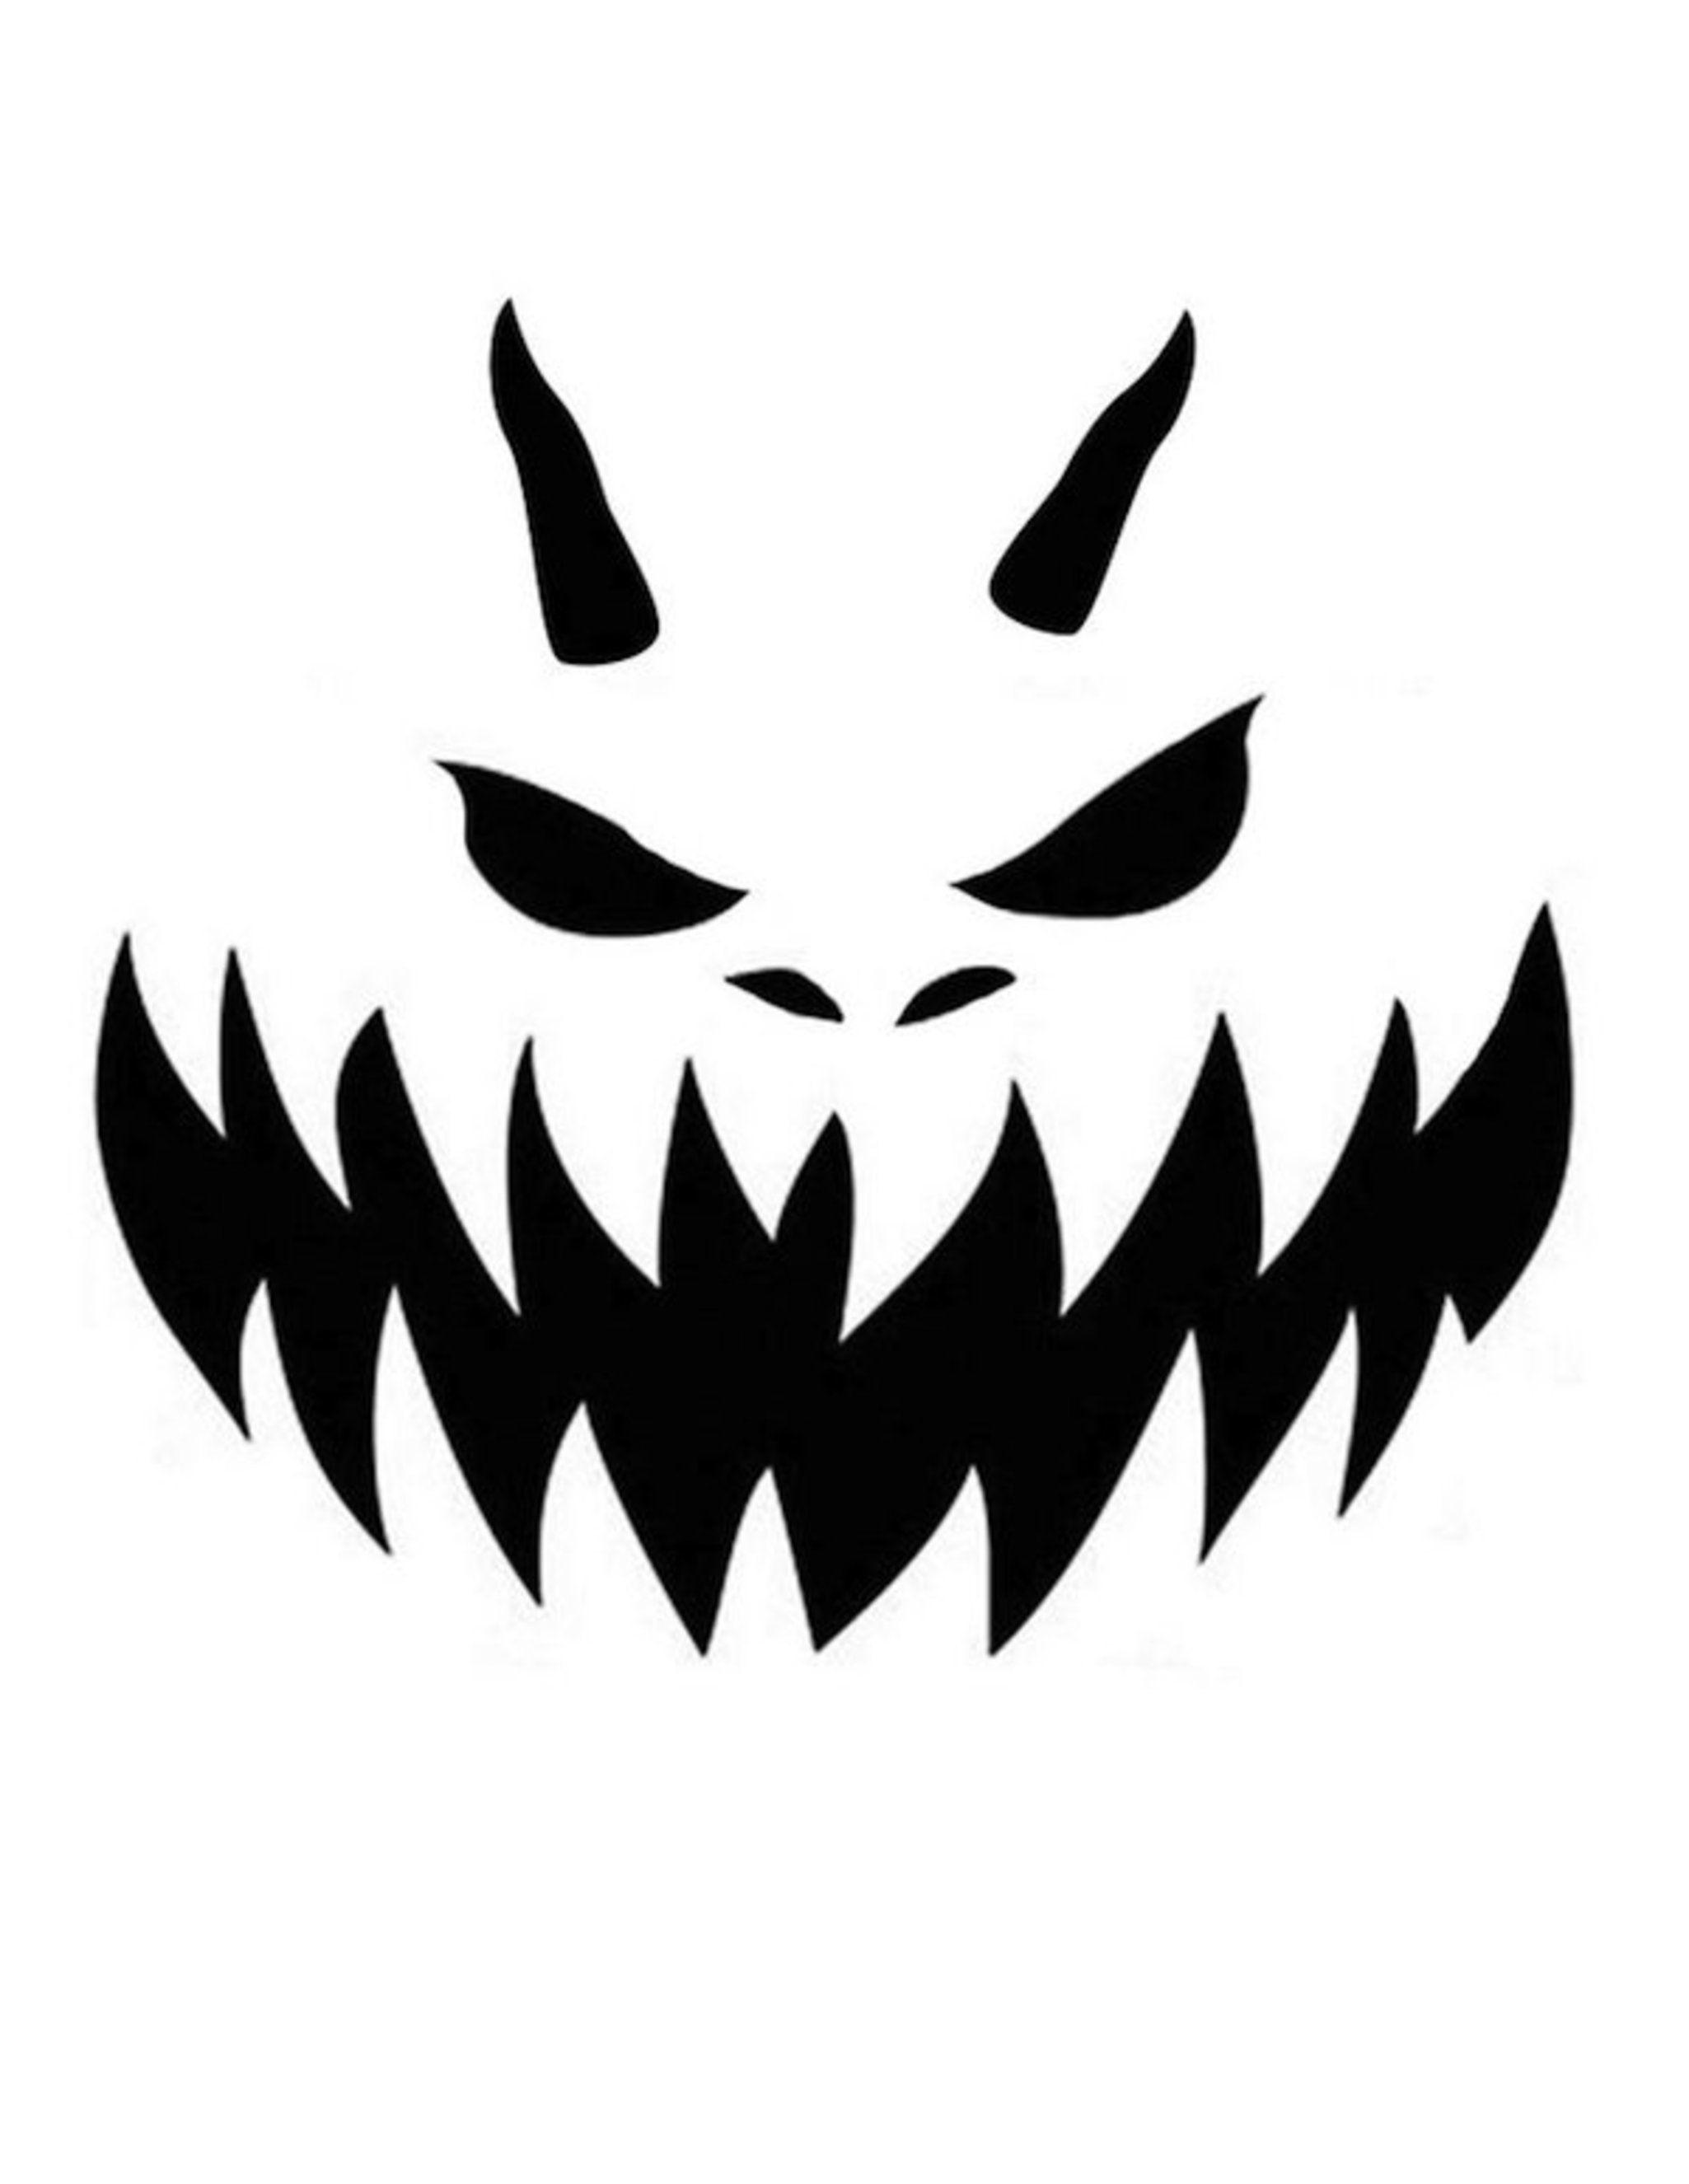 pumpkin template devil  Pumpkin-Carving Templates Galore for Your Best Jack-o ...